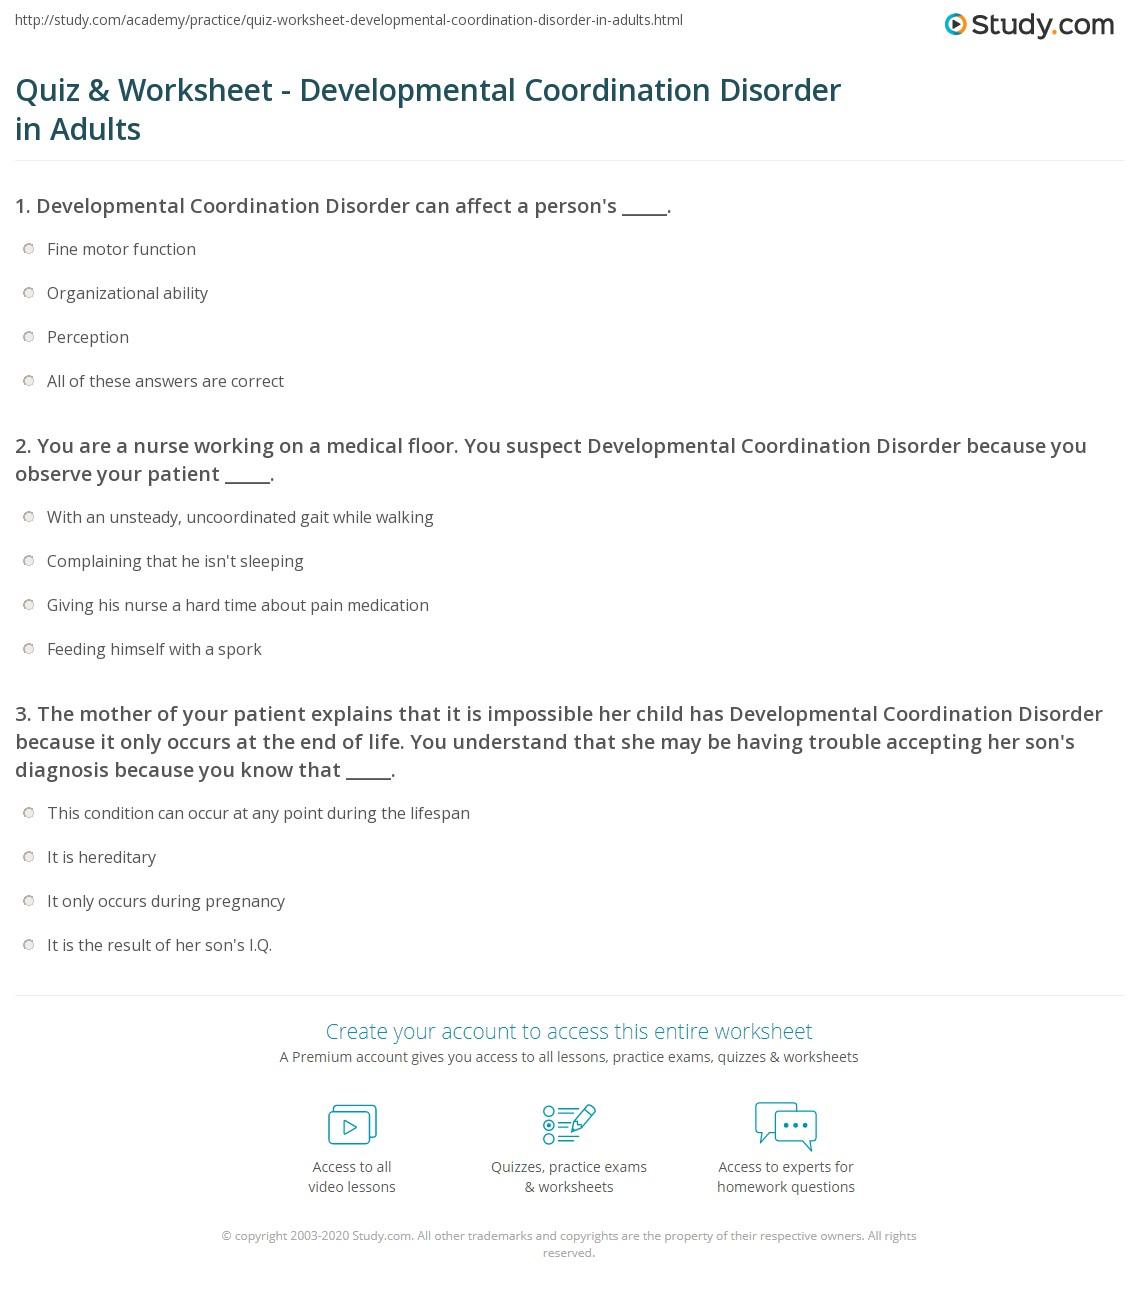 West bend ovenette manual ebook array developmental coordination disorder rh developmental coordination disorder angelayu us fandeluxe Gallery